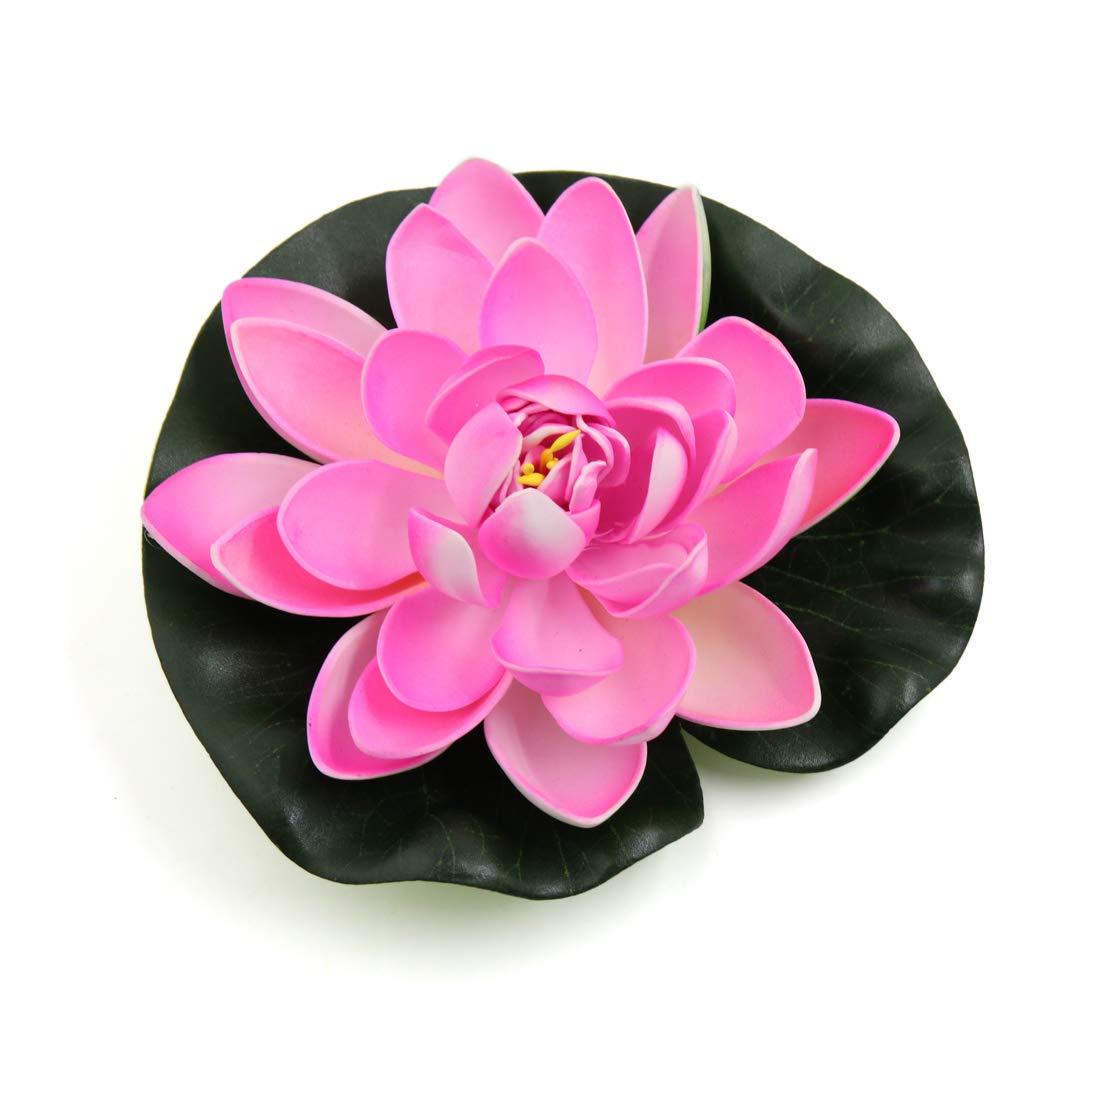 Uxcell Pink Foam Lotus Flower Aquarium Pond Decor Floating Plant